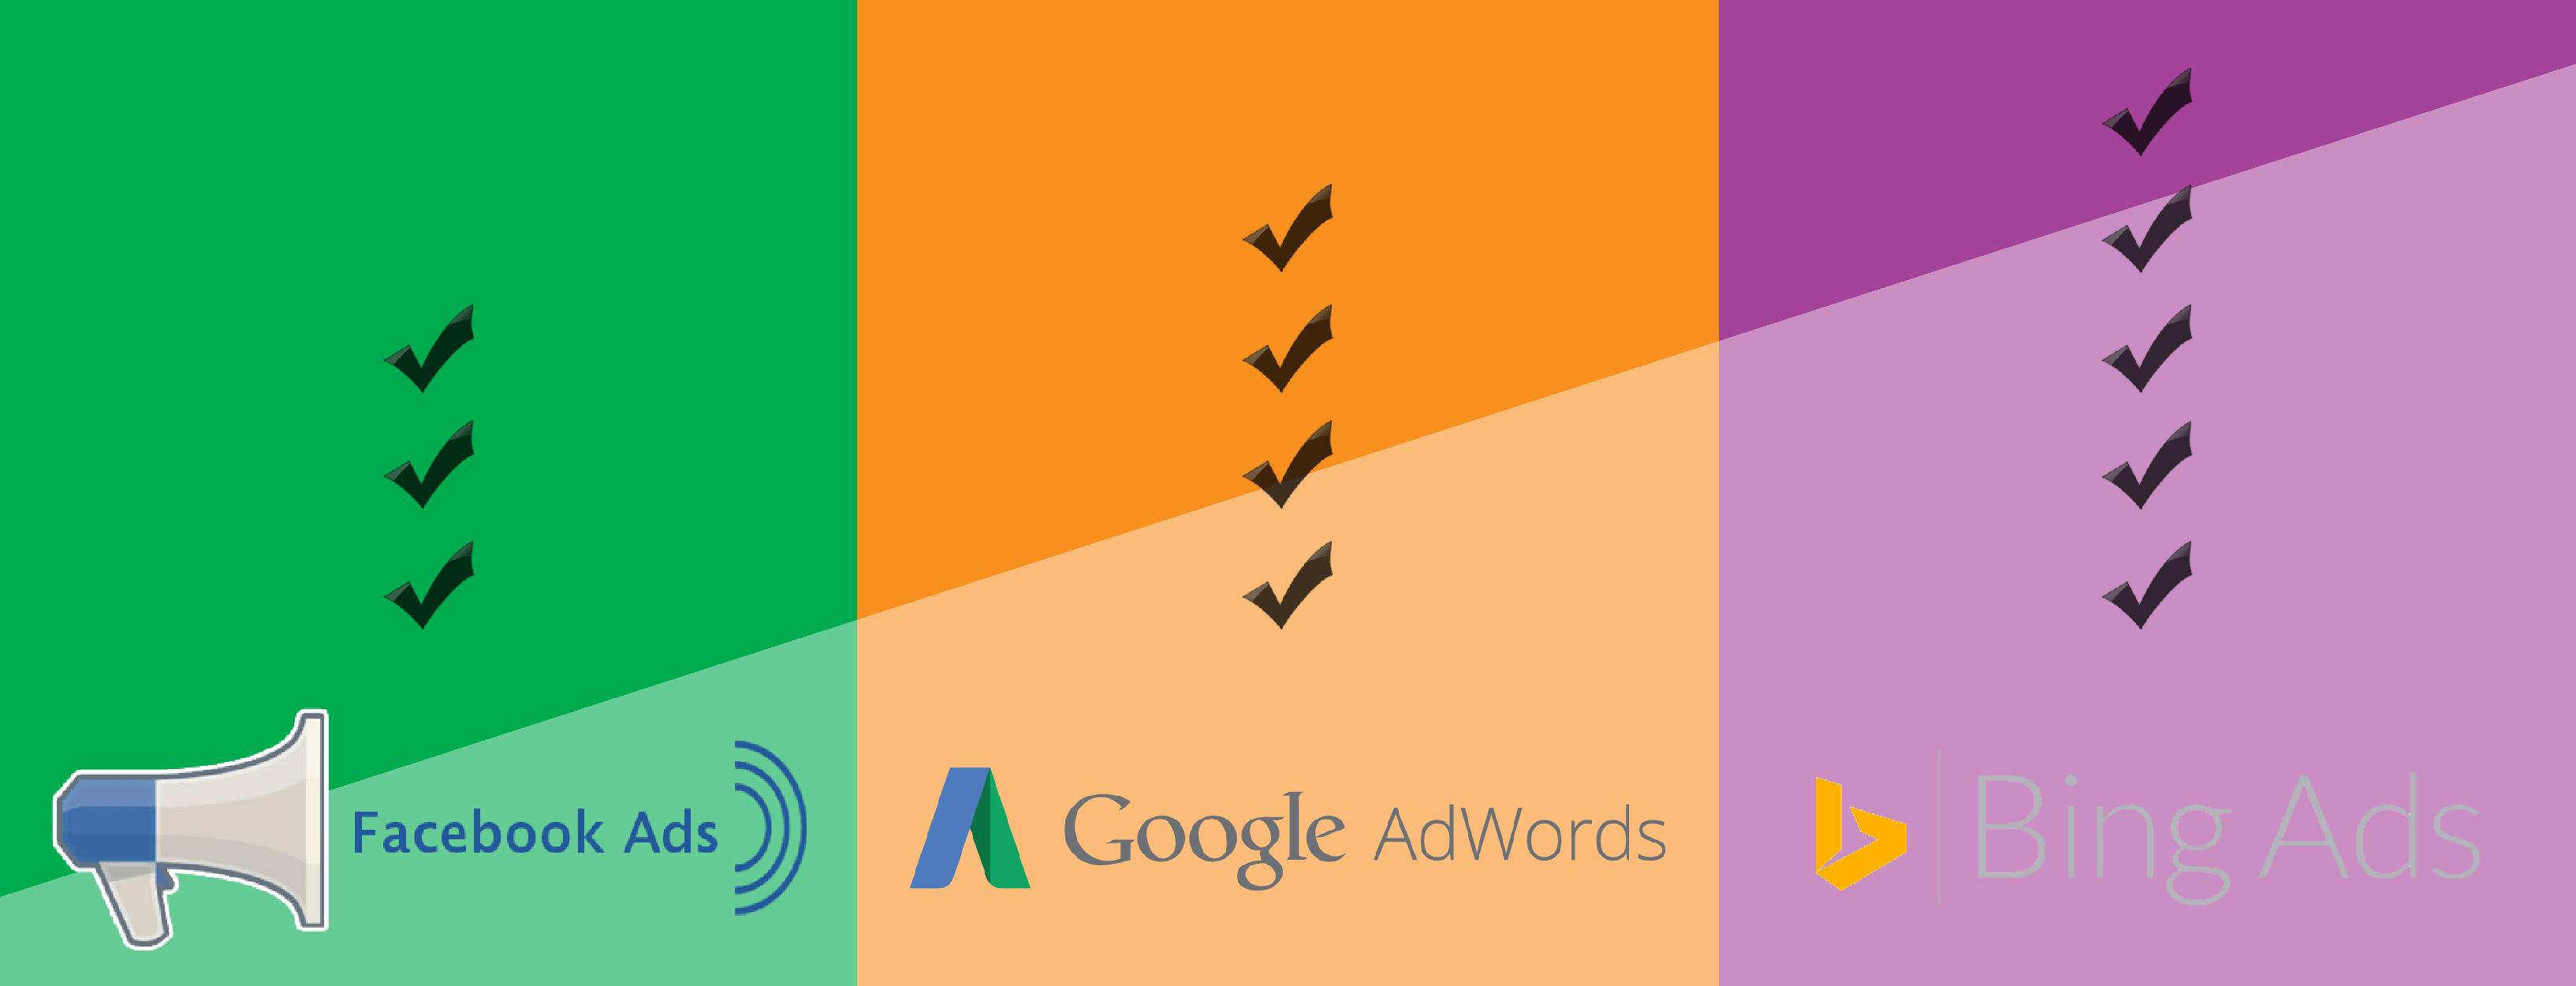 best-paid-search-platforms-volume-nine